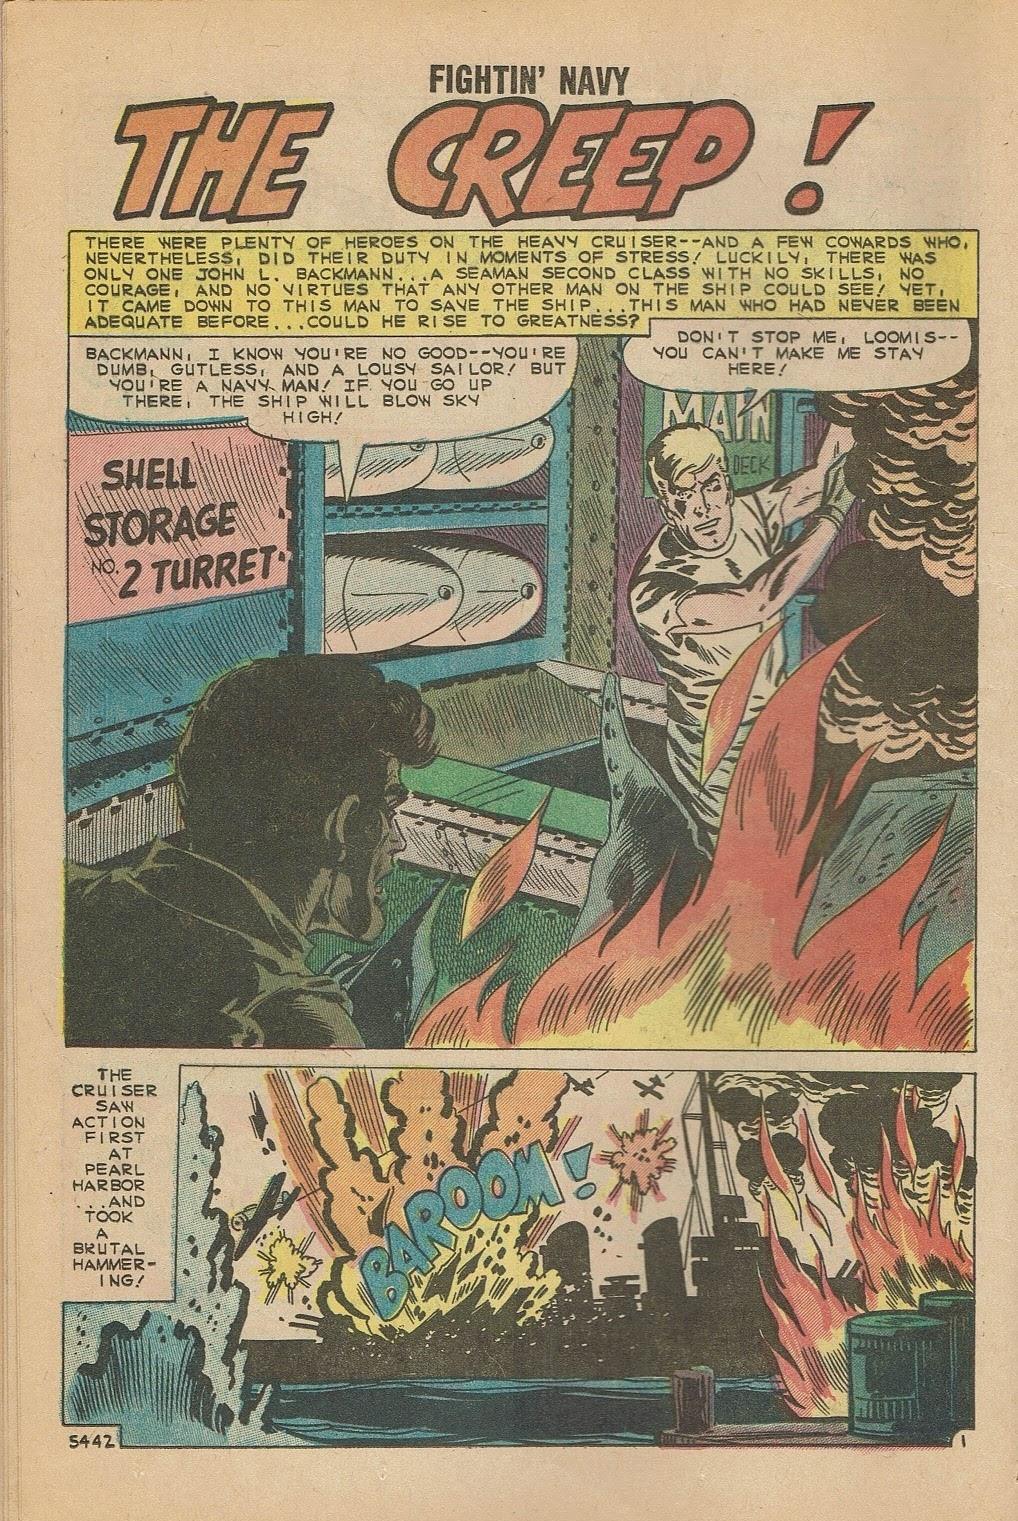 Read online Fightin' Navy comic -  Issue #95 - 12